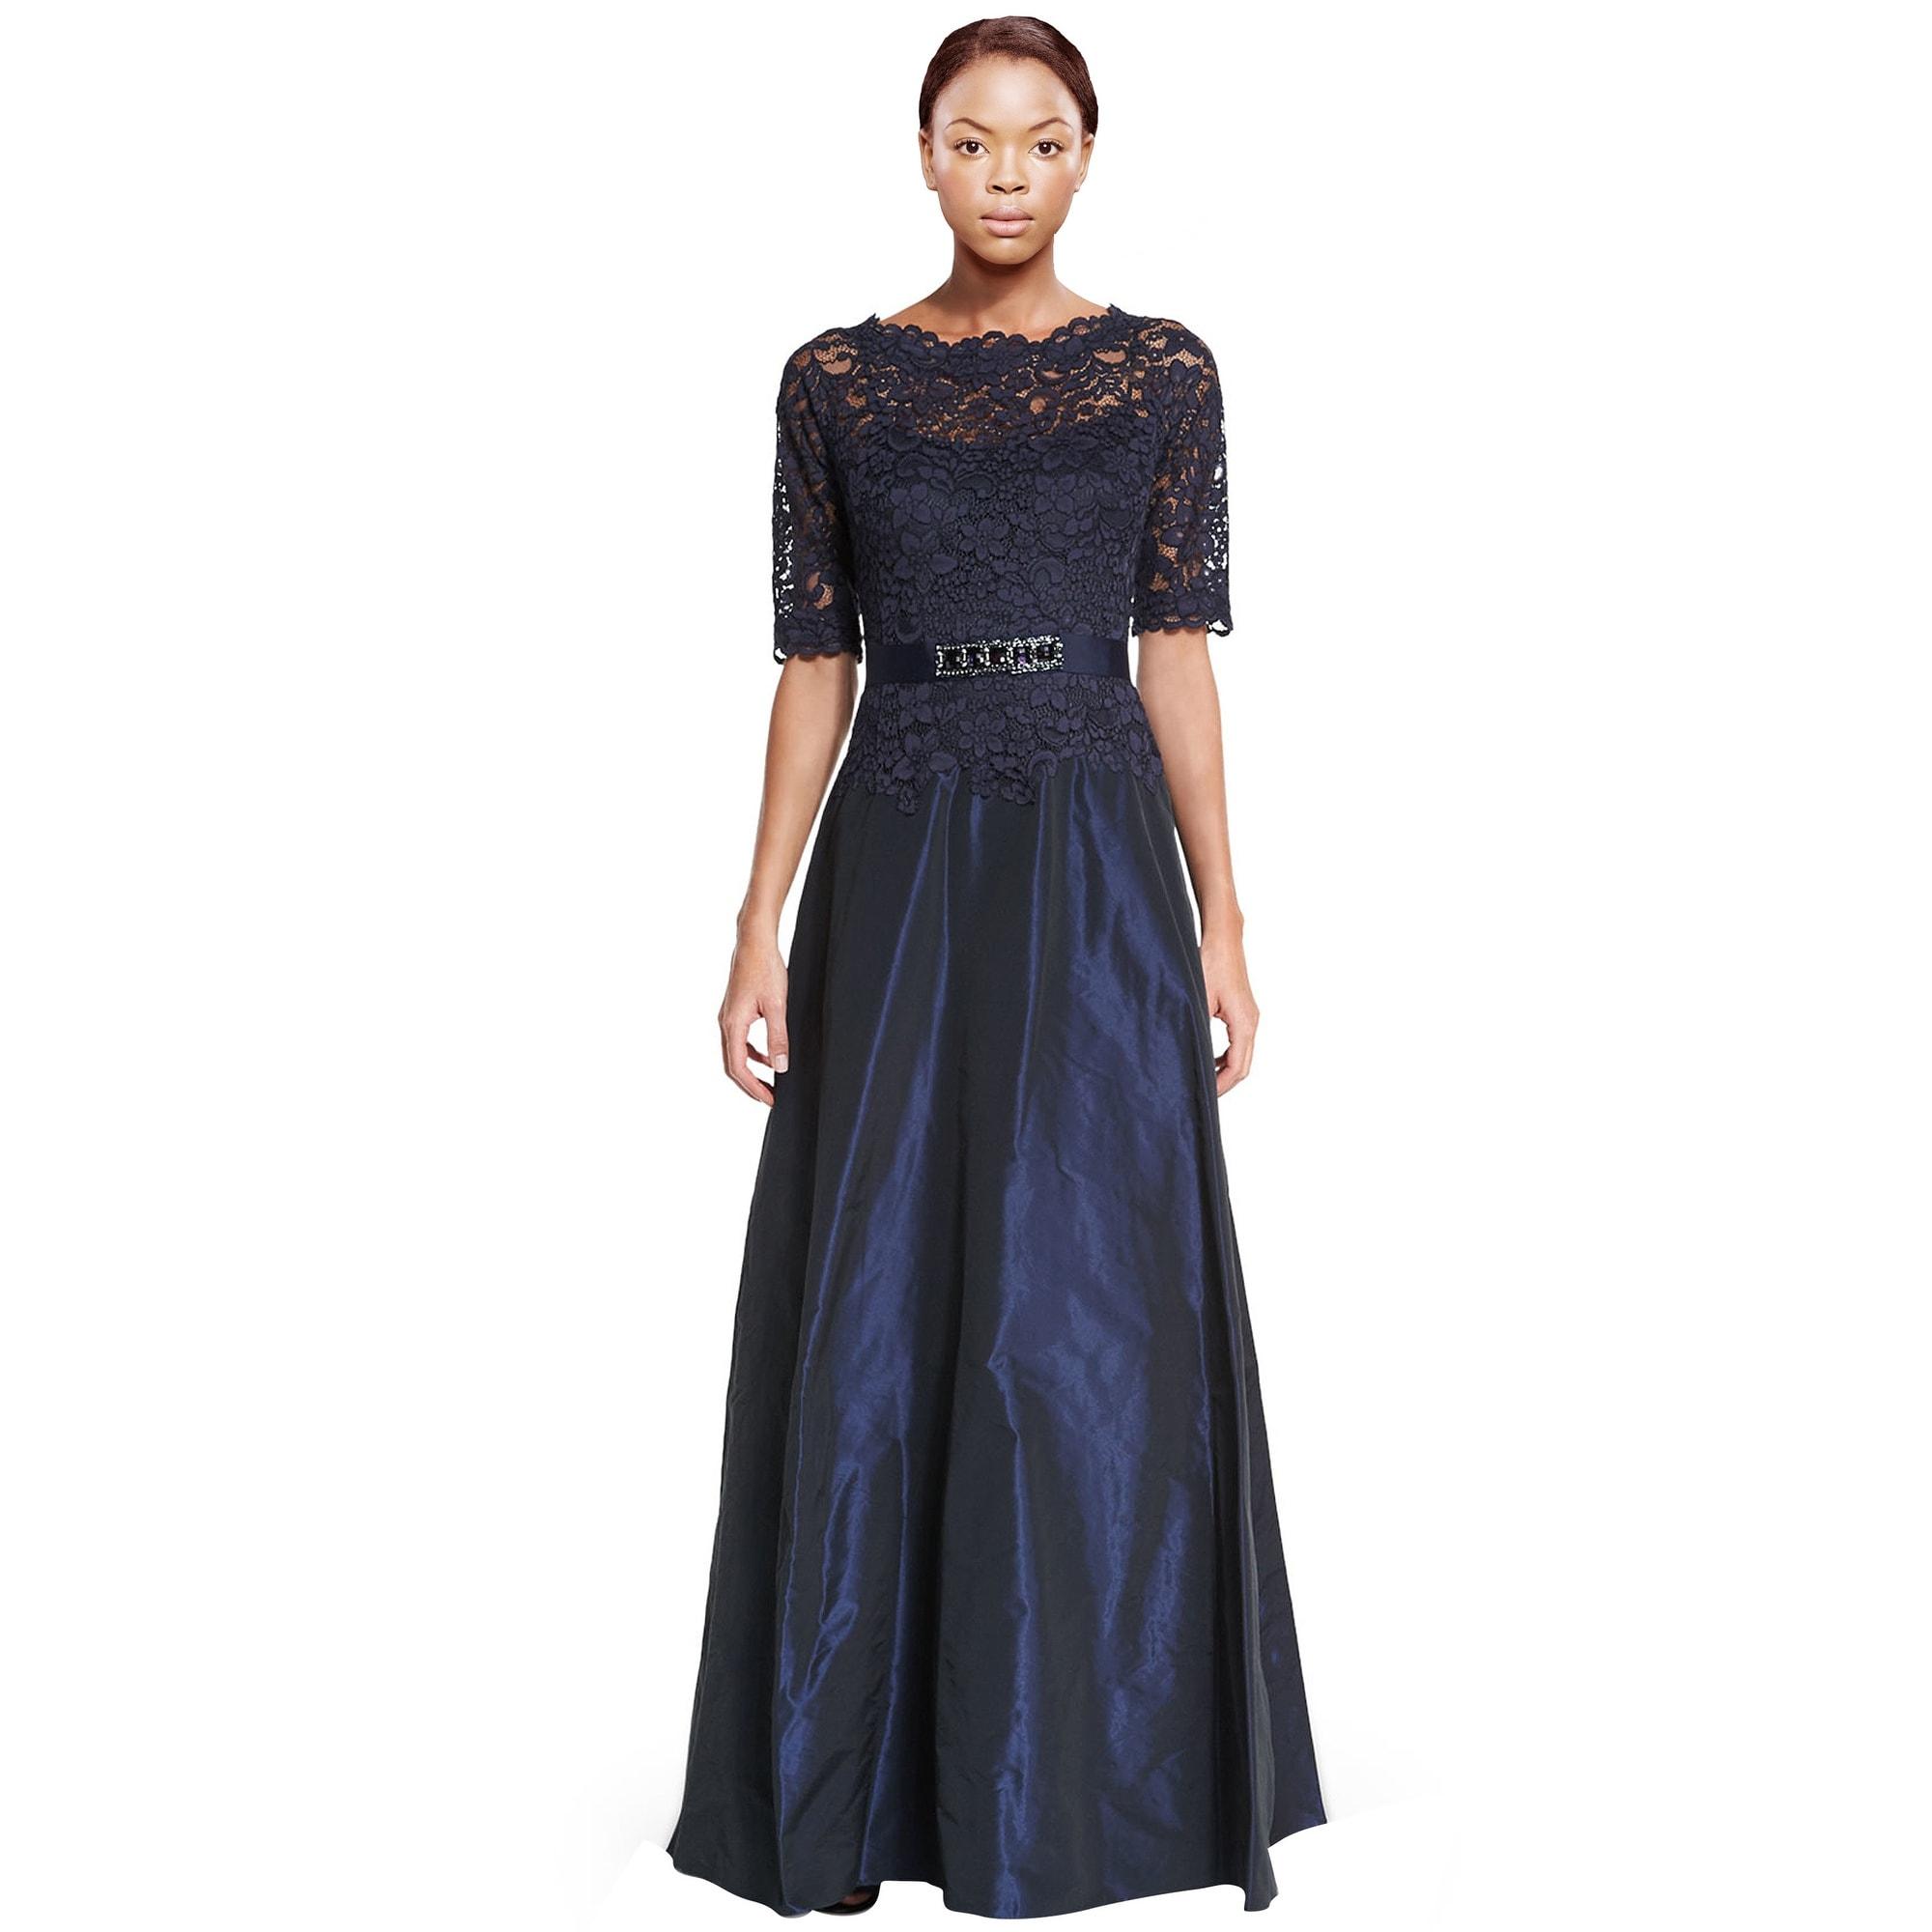 Shop Teri Jon Scalloped Lace Top Taffeta Evening Gown Dress - 6 ...